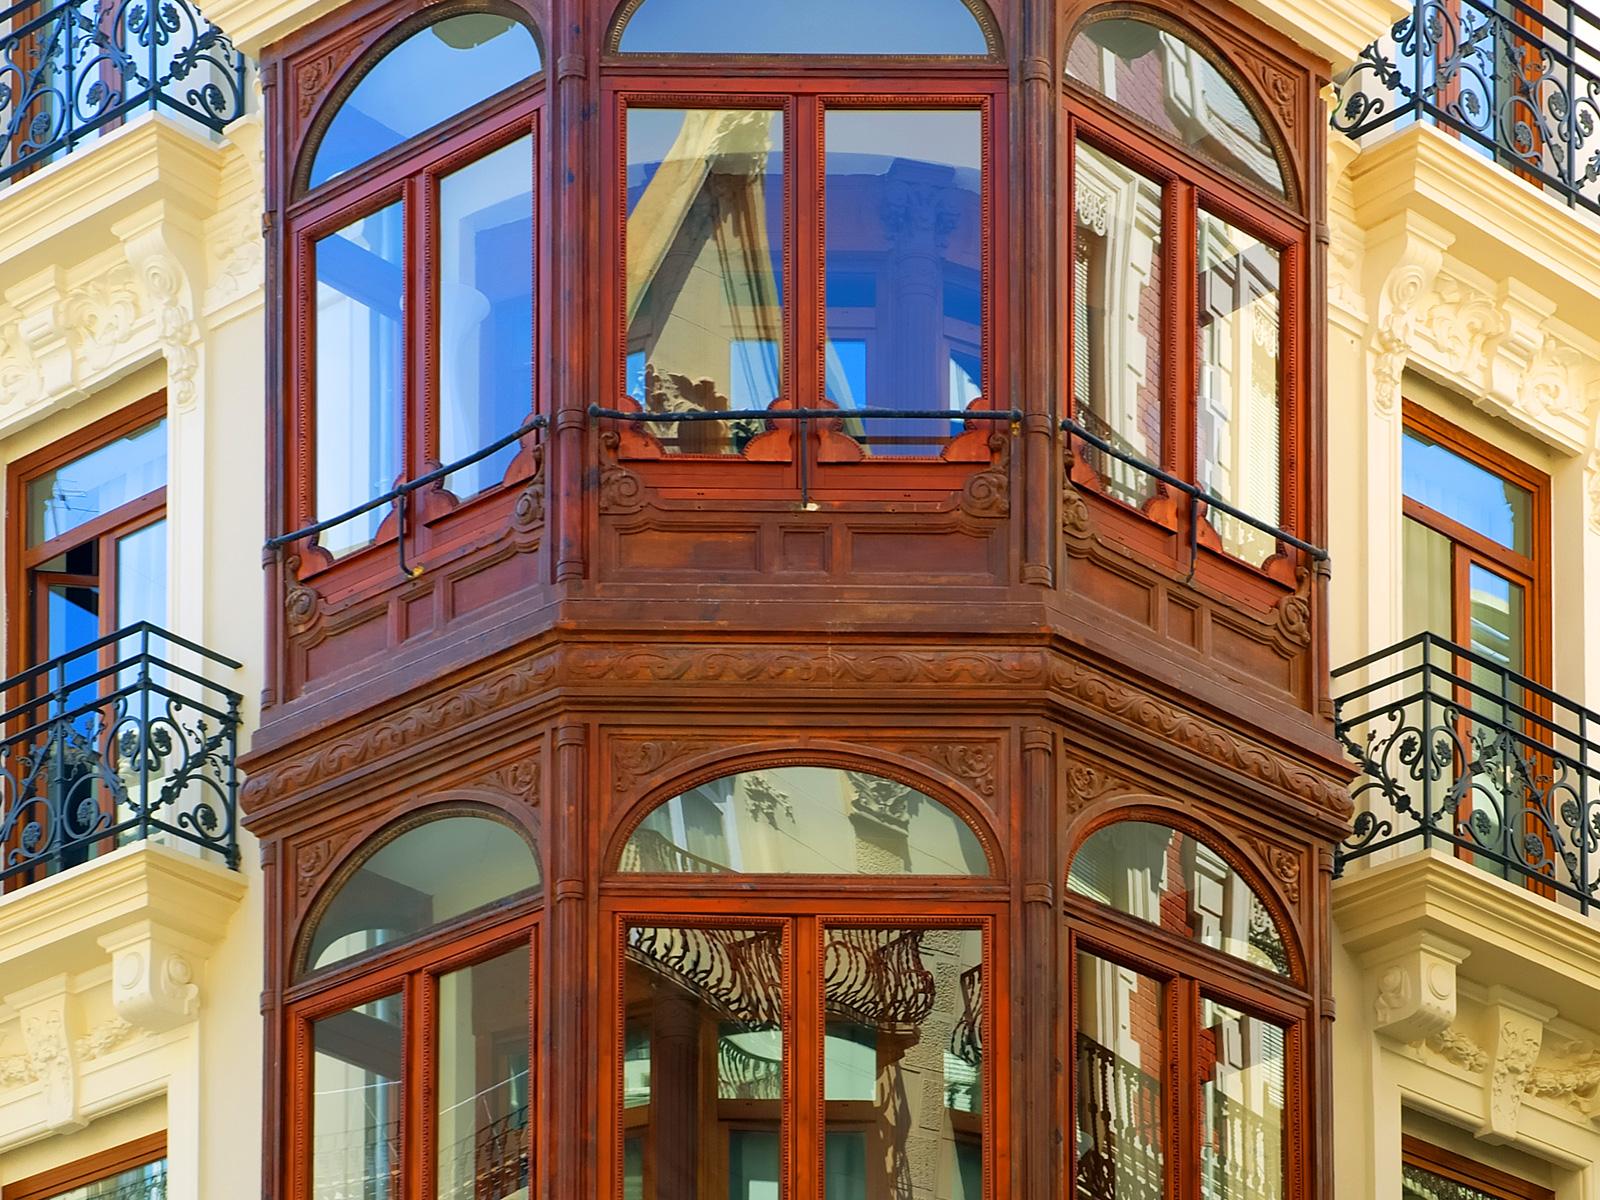 Veranda della Camera Exec. - Vincci Palace 4*